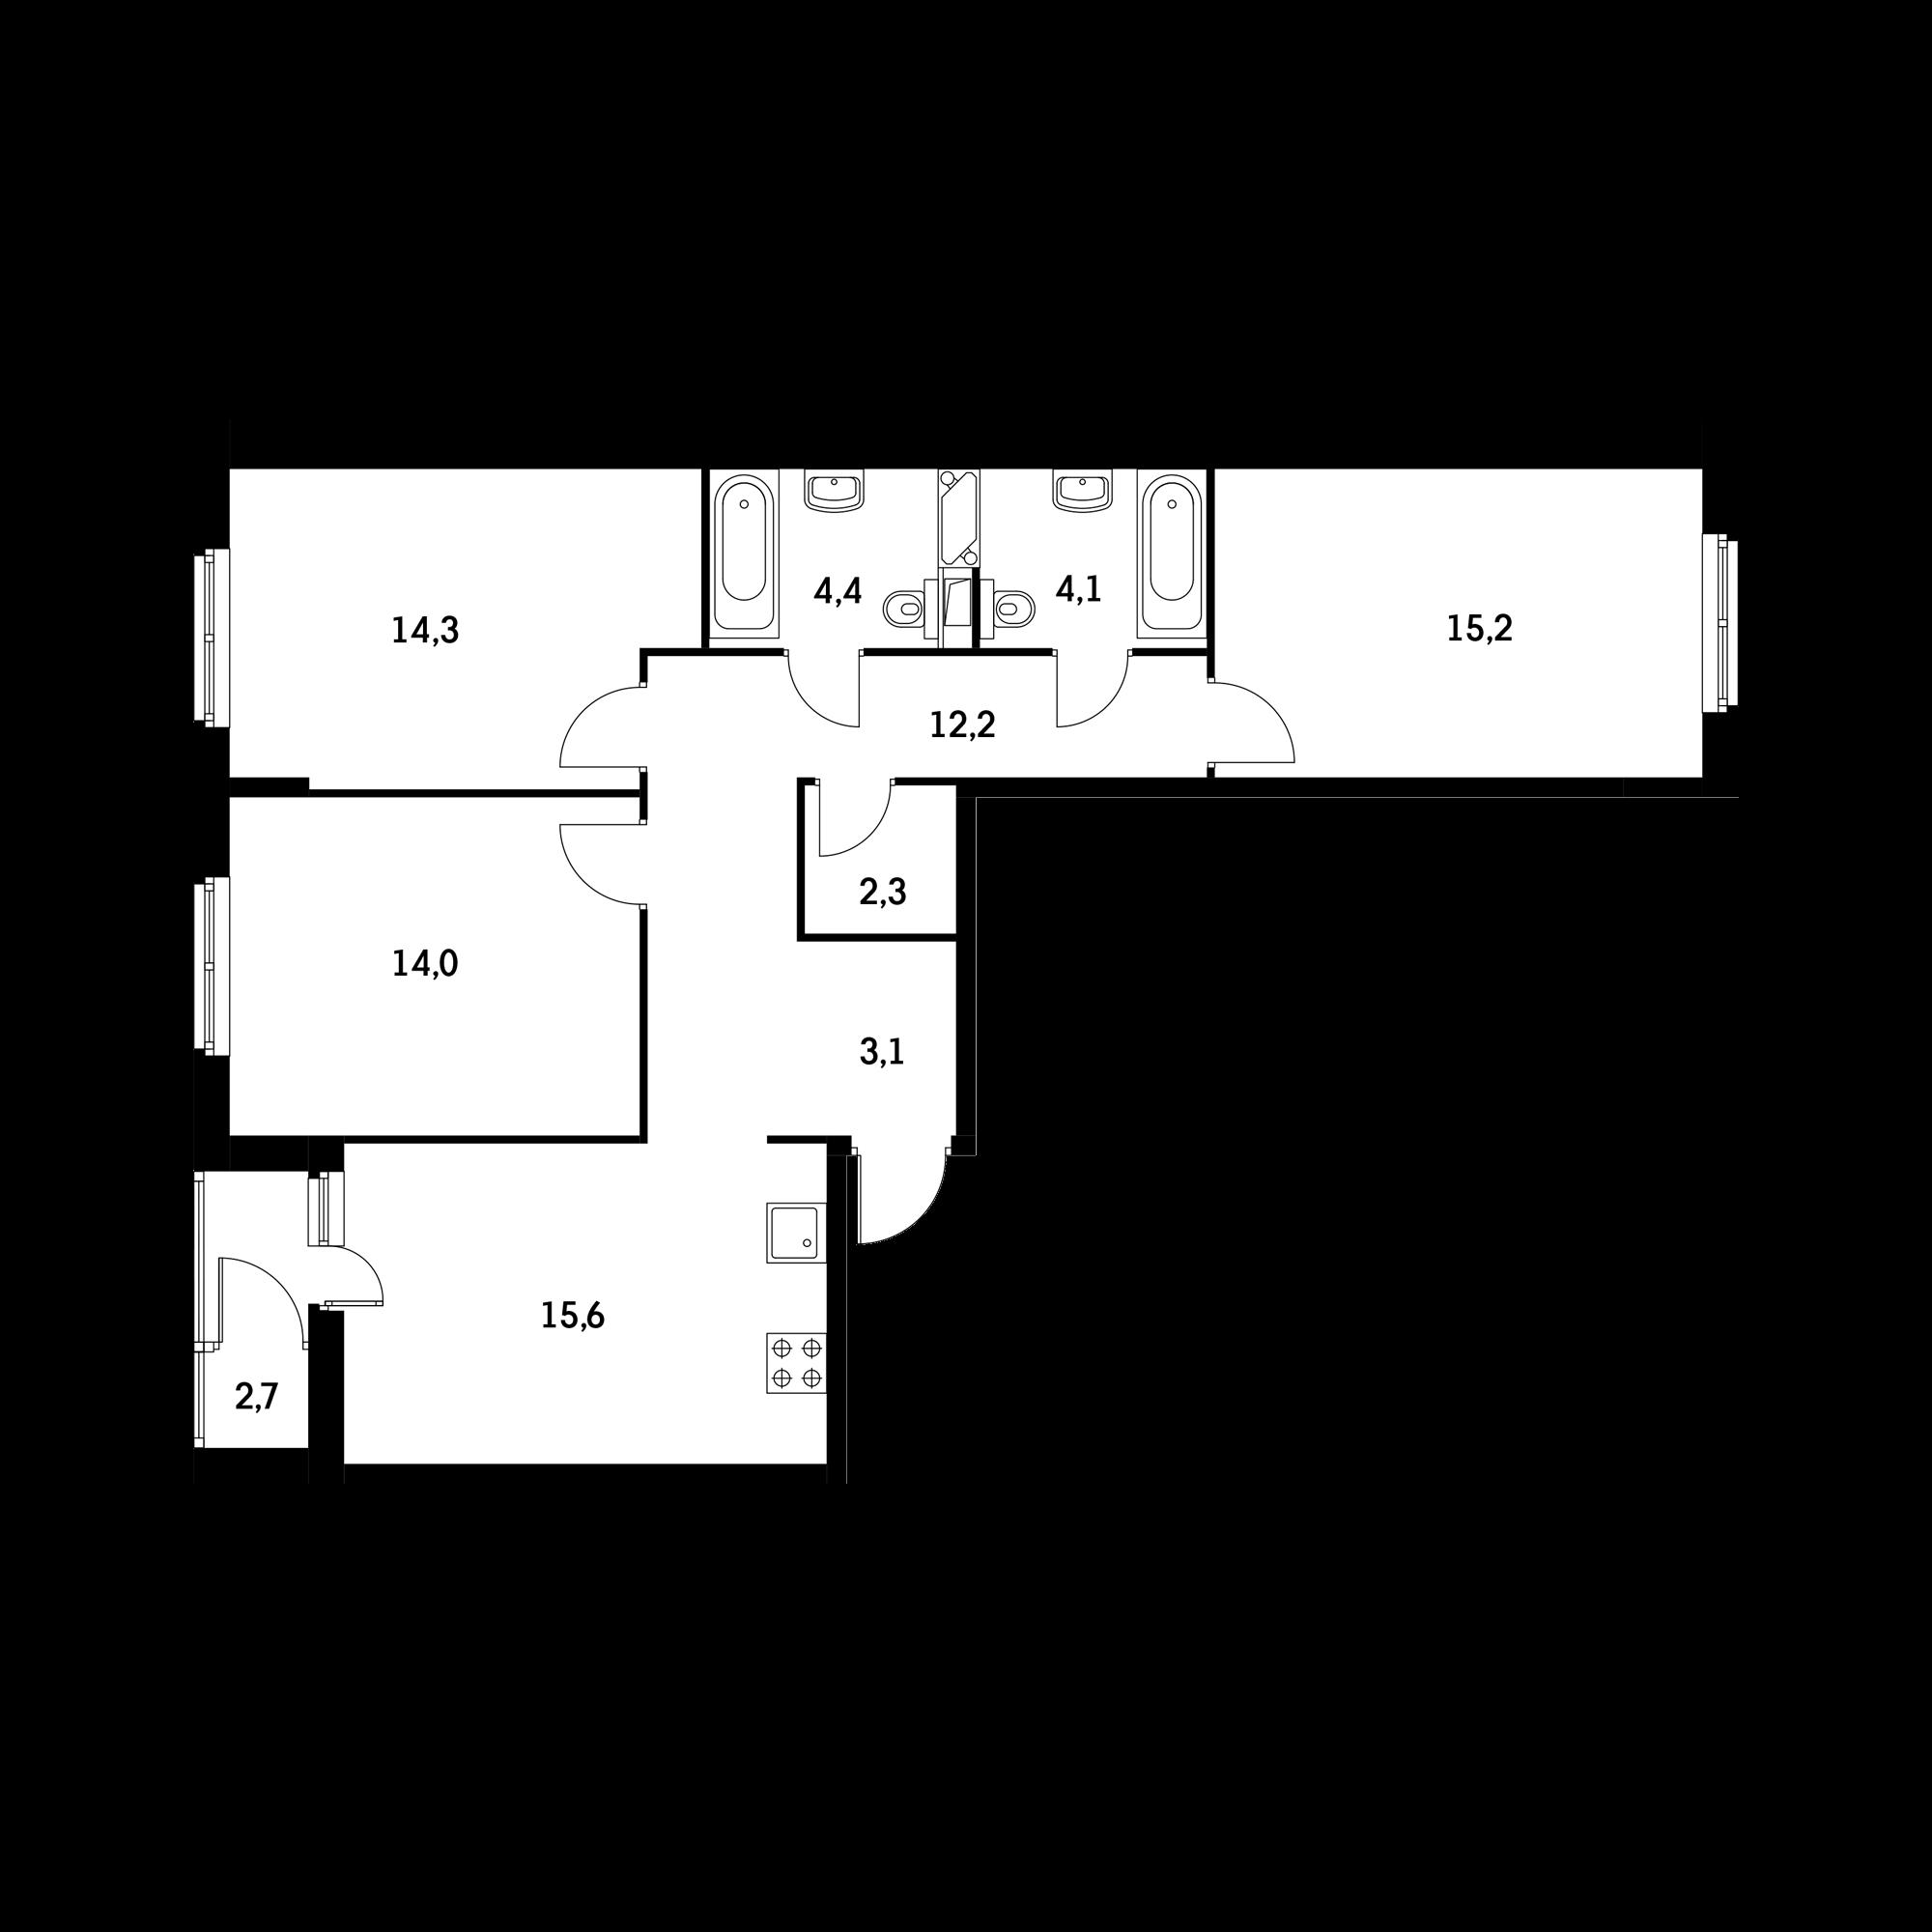 3EL1*